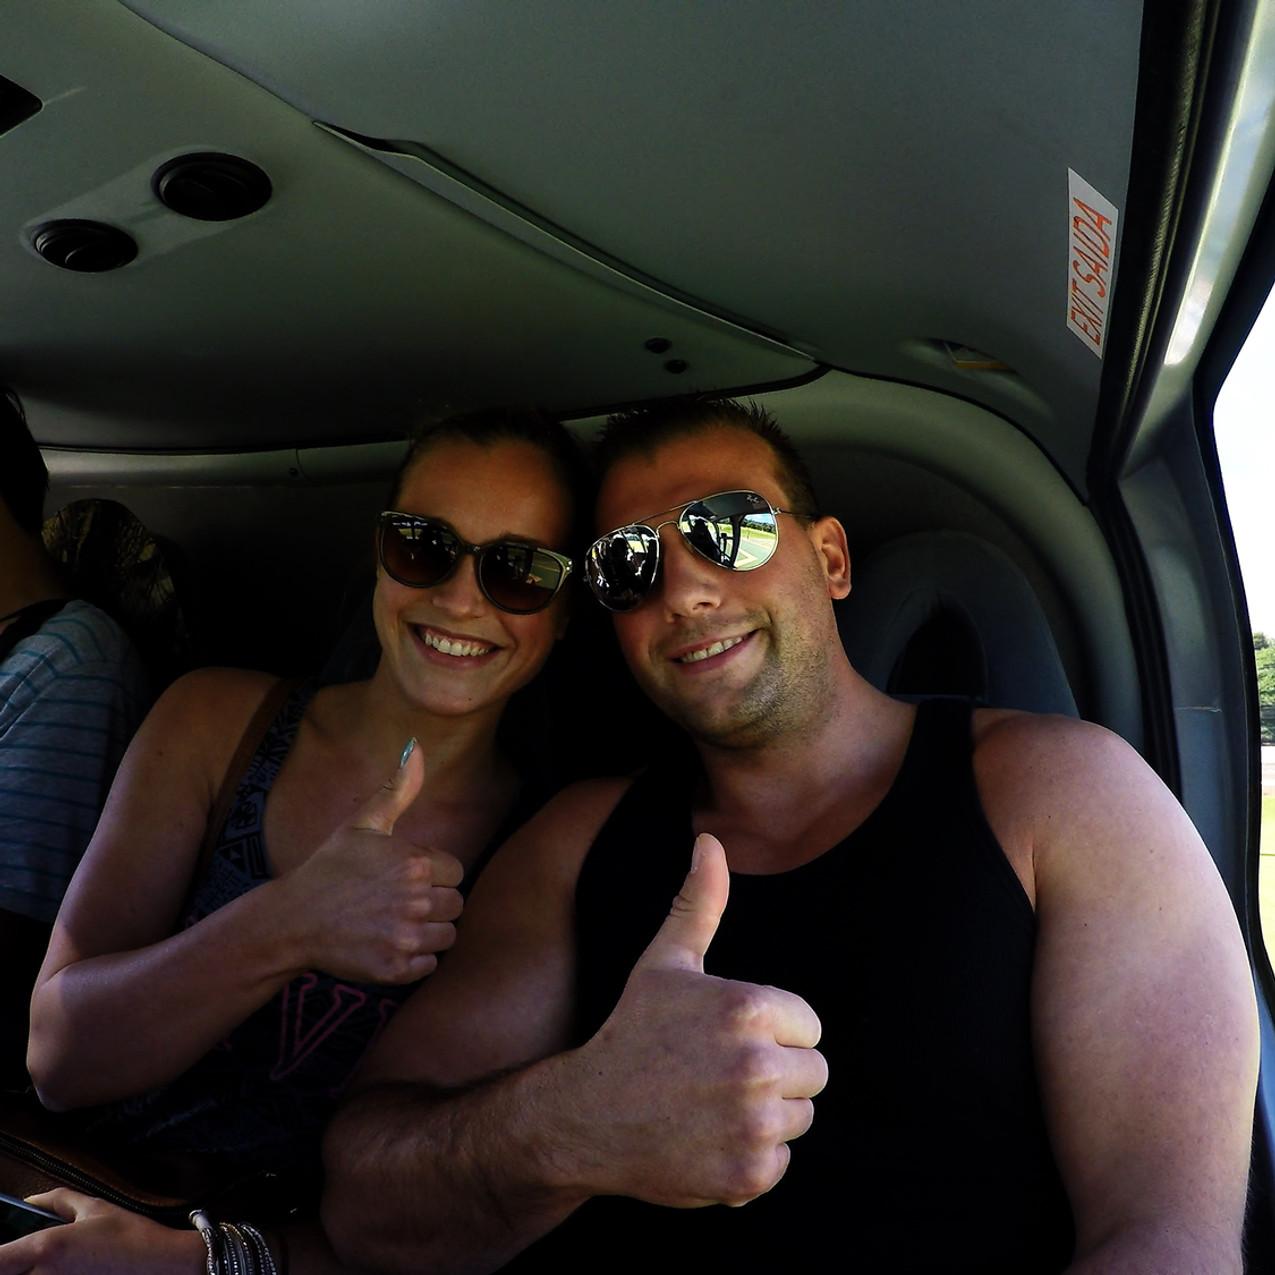 Helikopterflug Wasserfälle Iguacu Brasilien und Argentinien